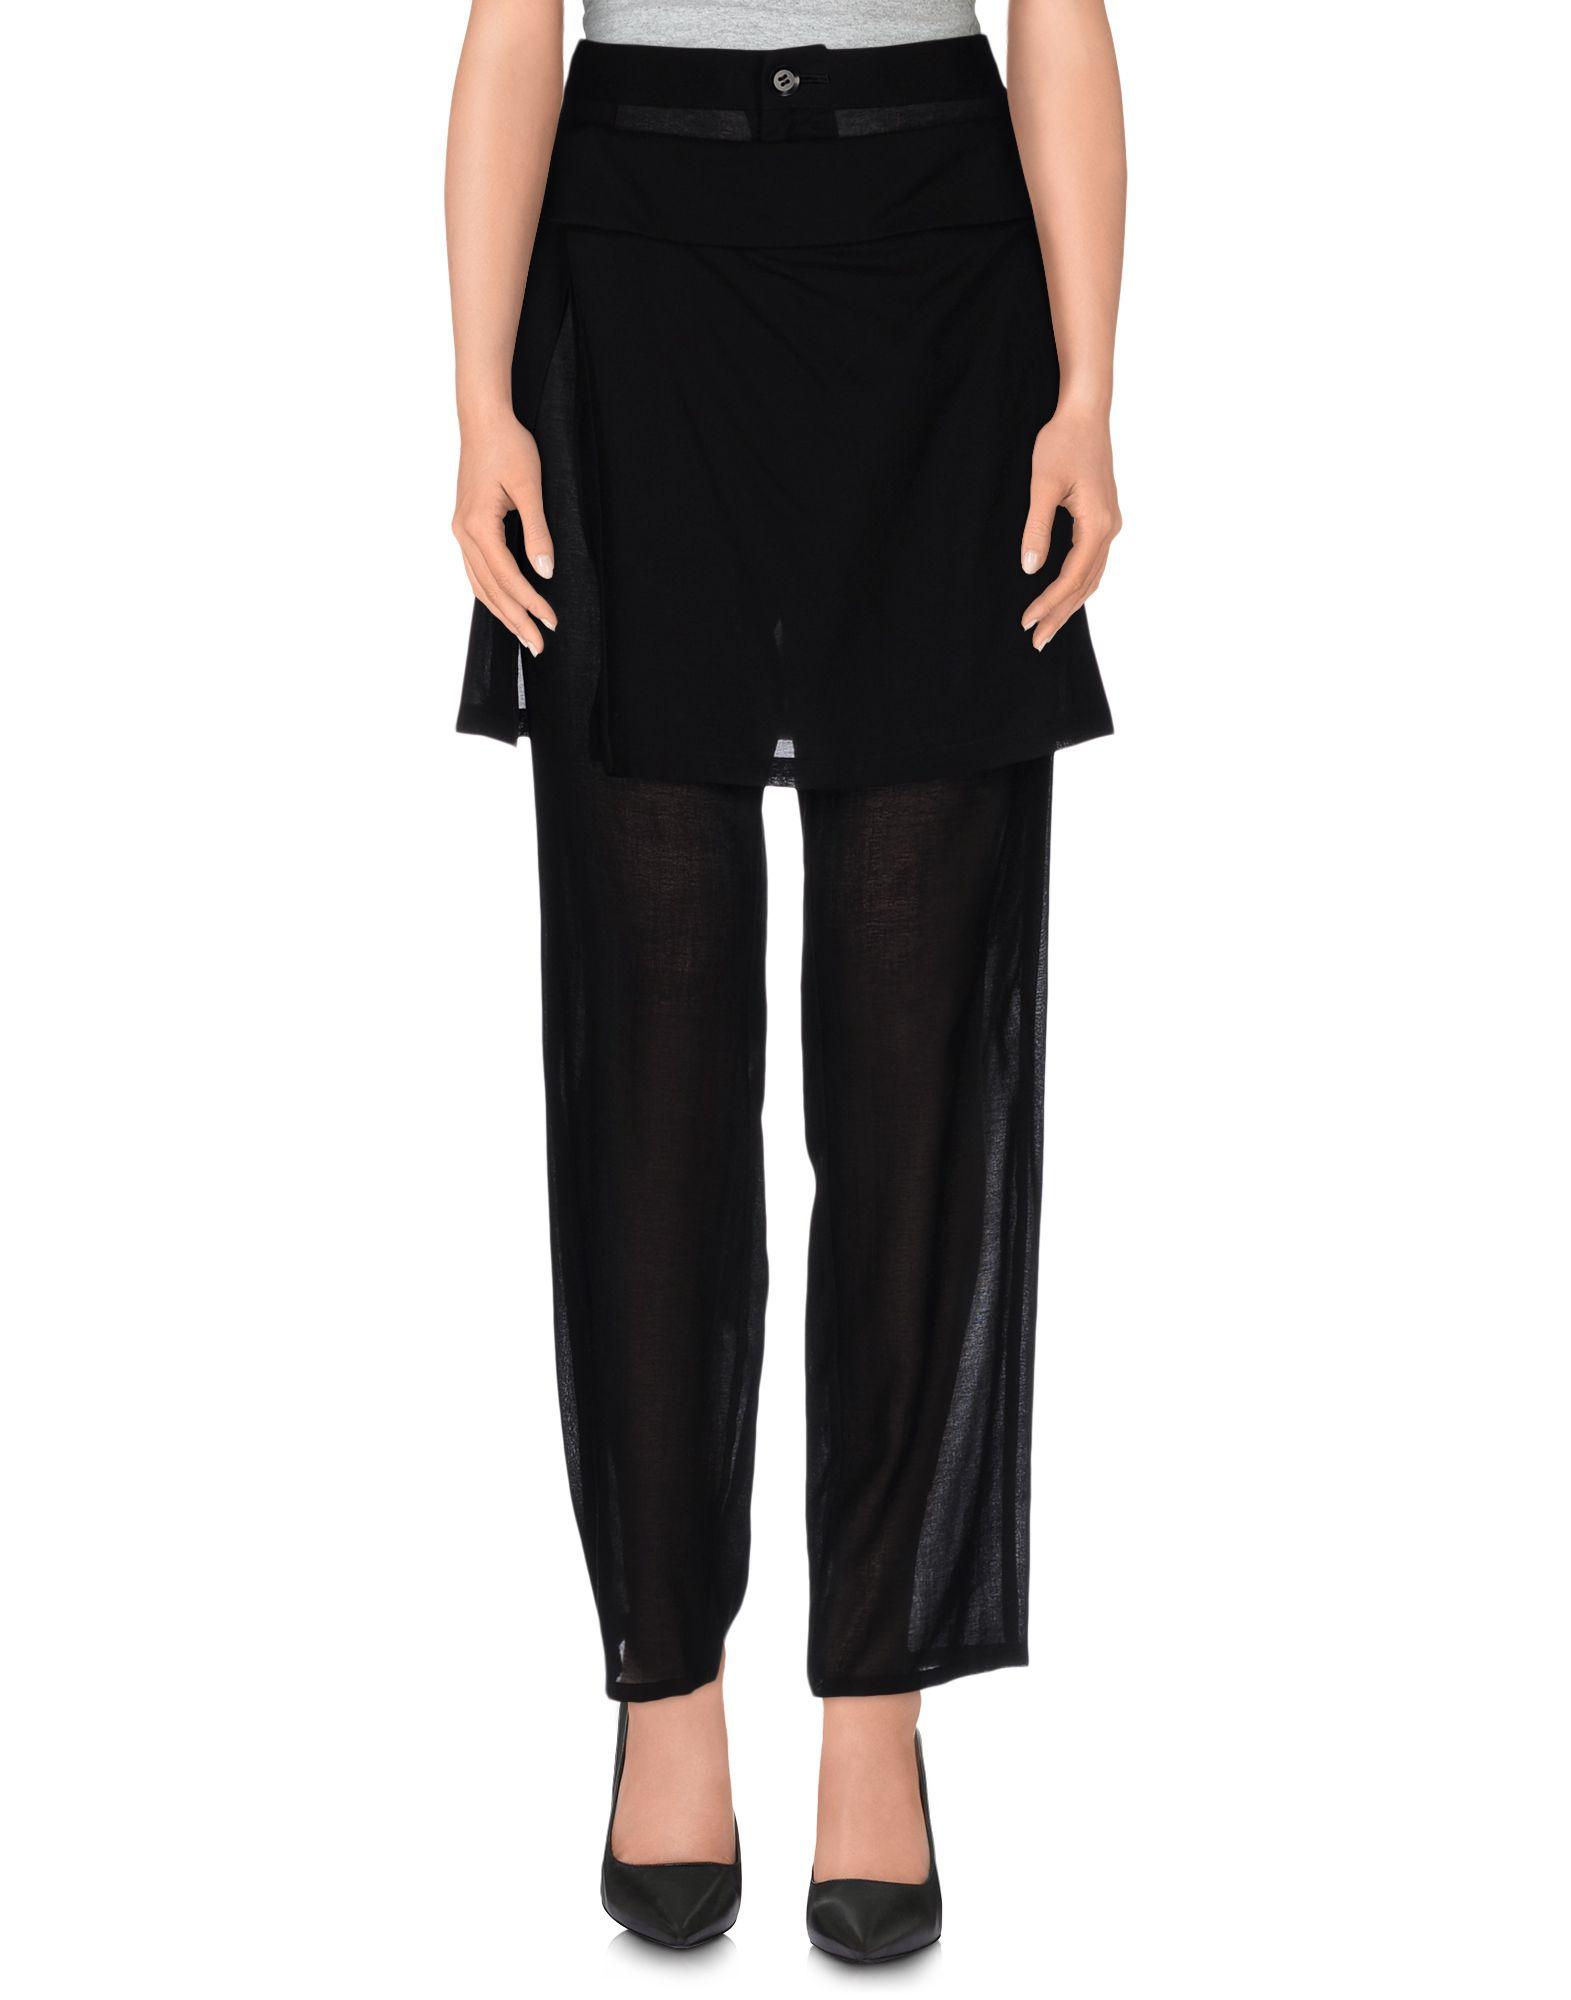 YOHJI YAMAMOTO Damen Hose Farbe Schwarz Größe 4